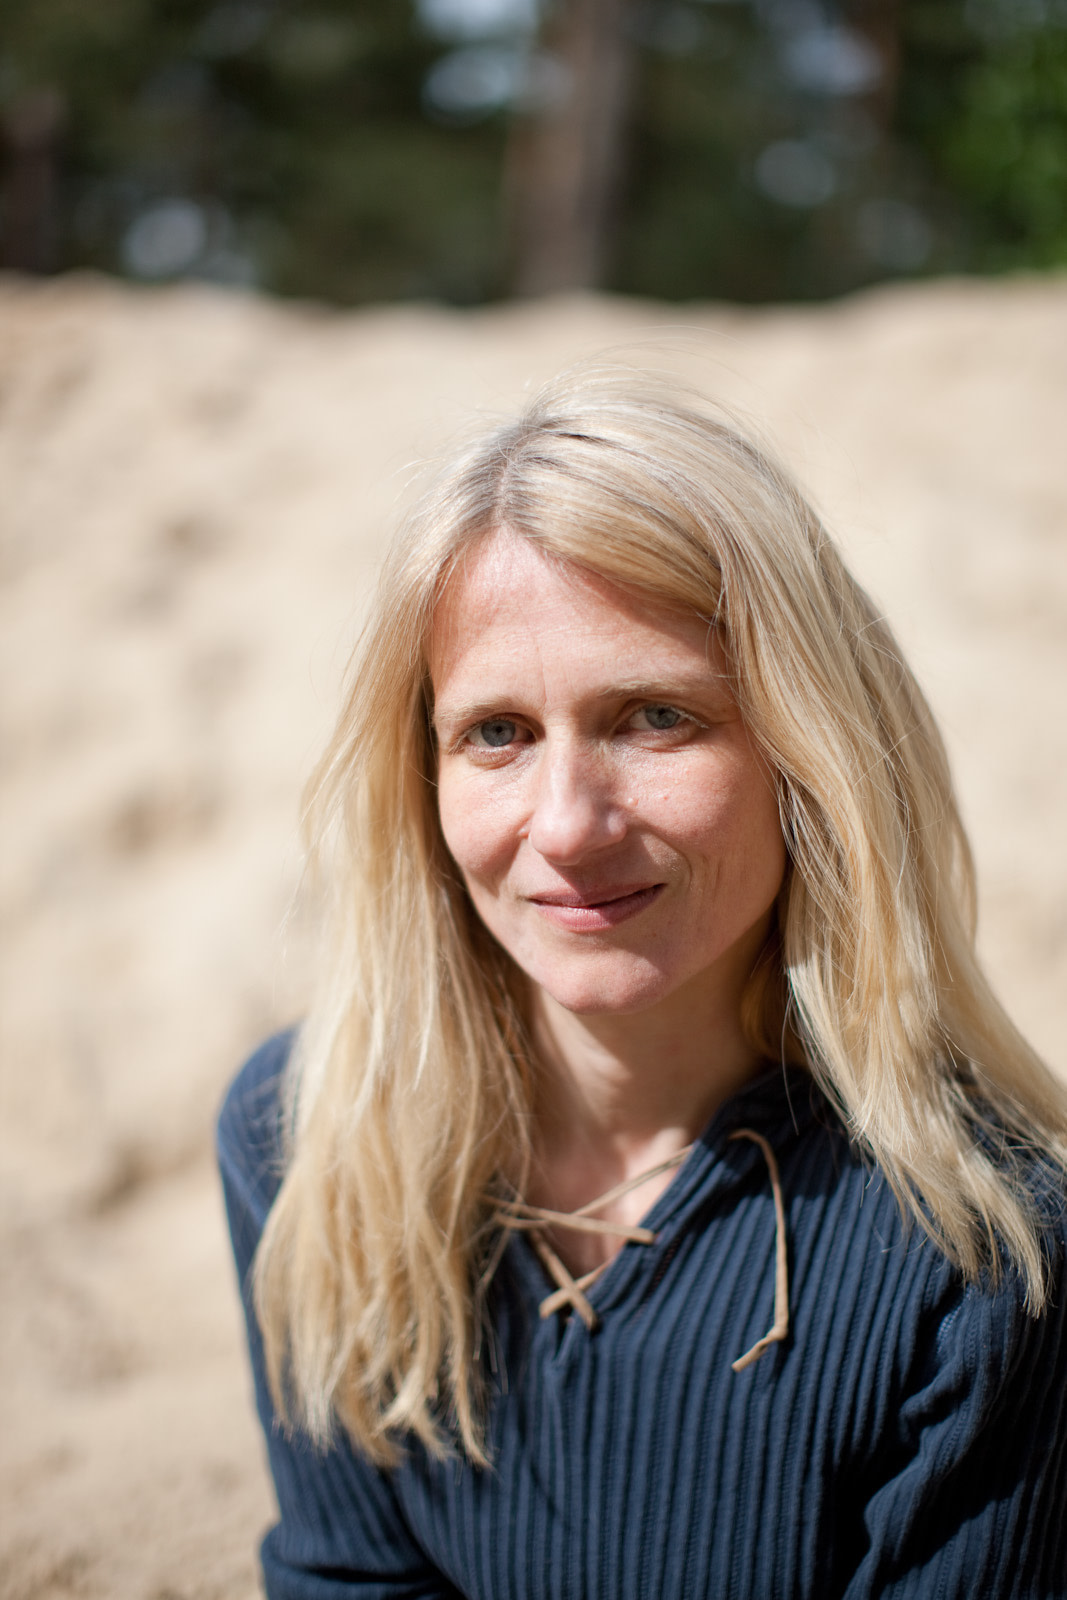 Friederike Habermann